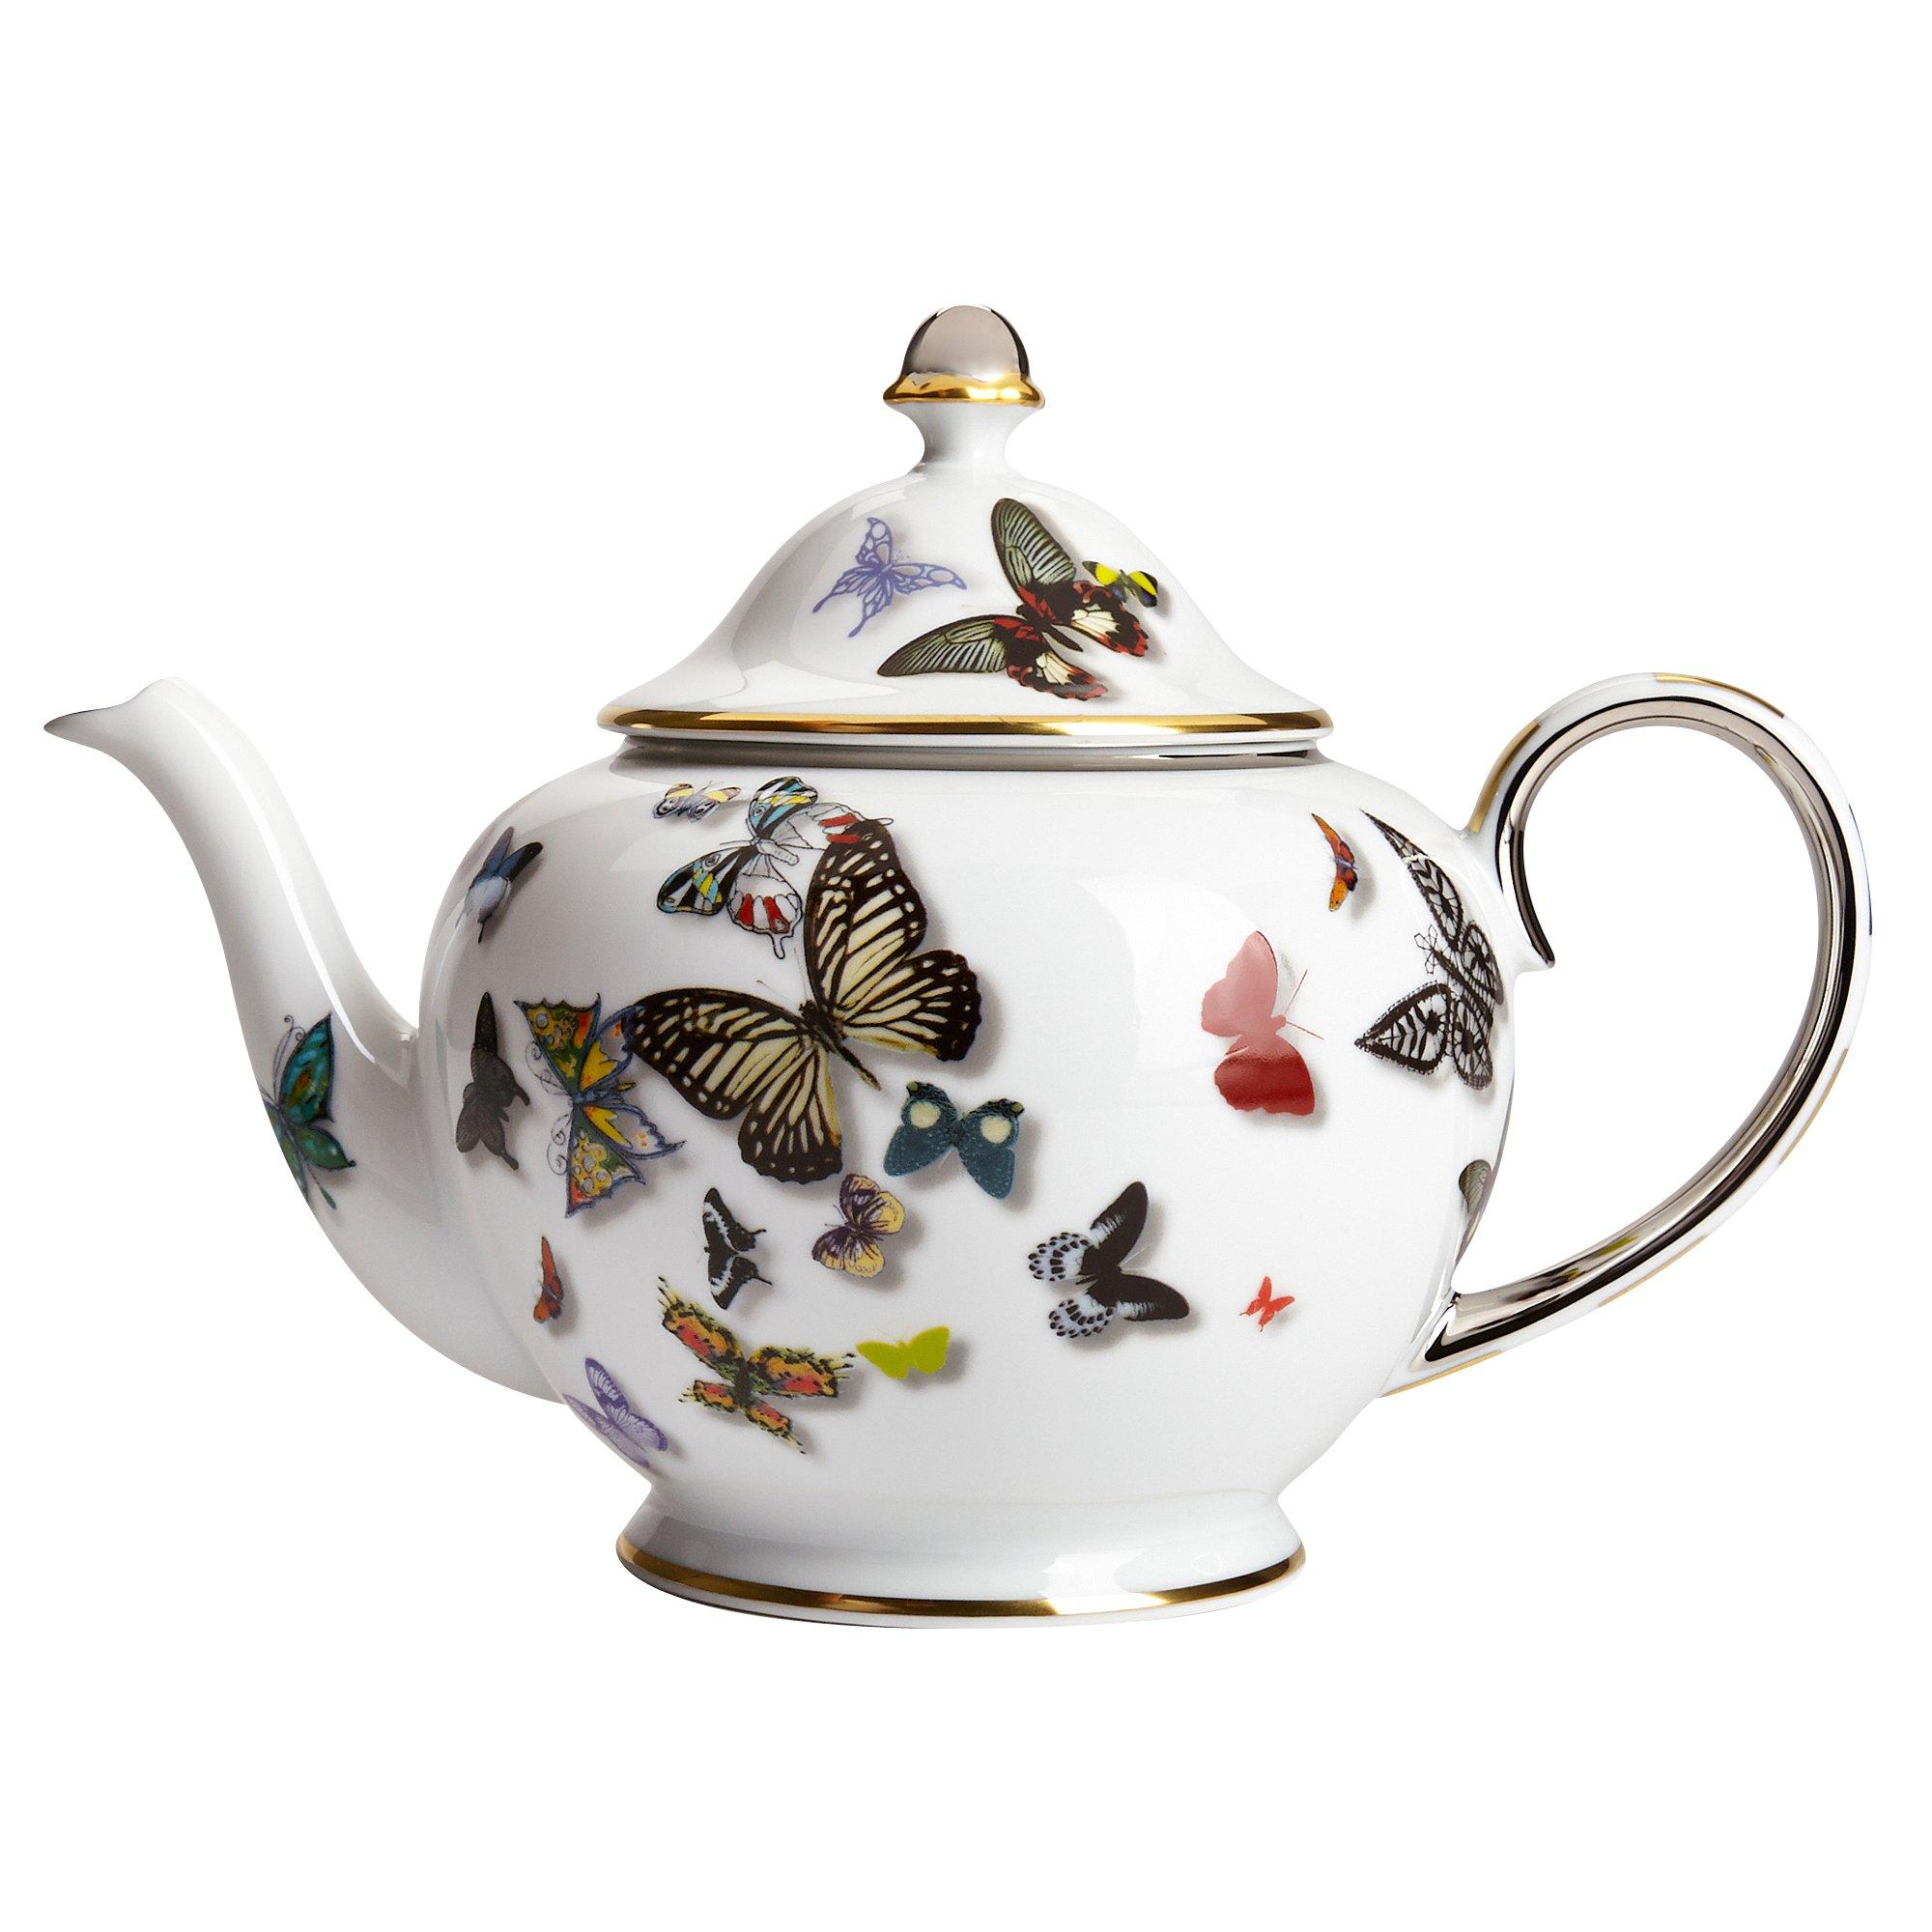 Christian Lacroix - Butterfly Parade Tea Pot by Christian Lacroix